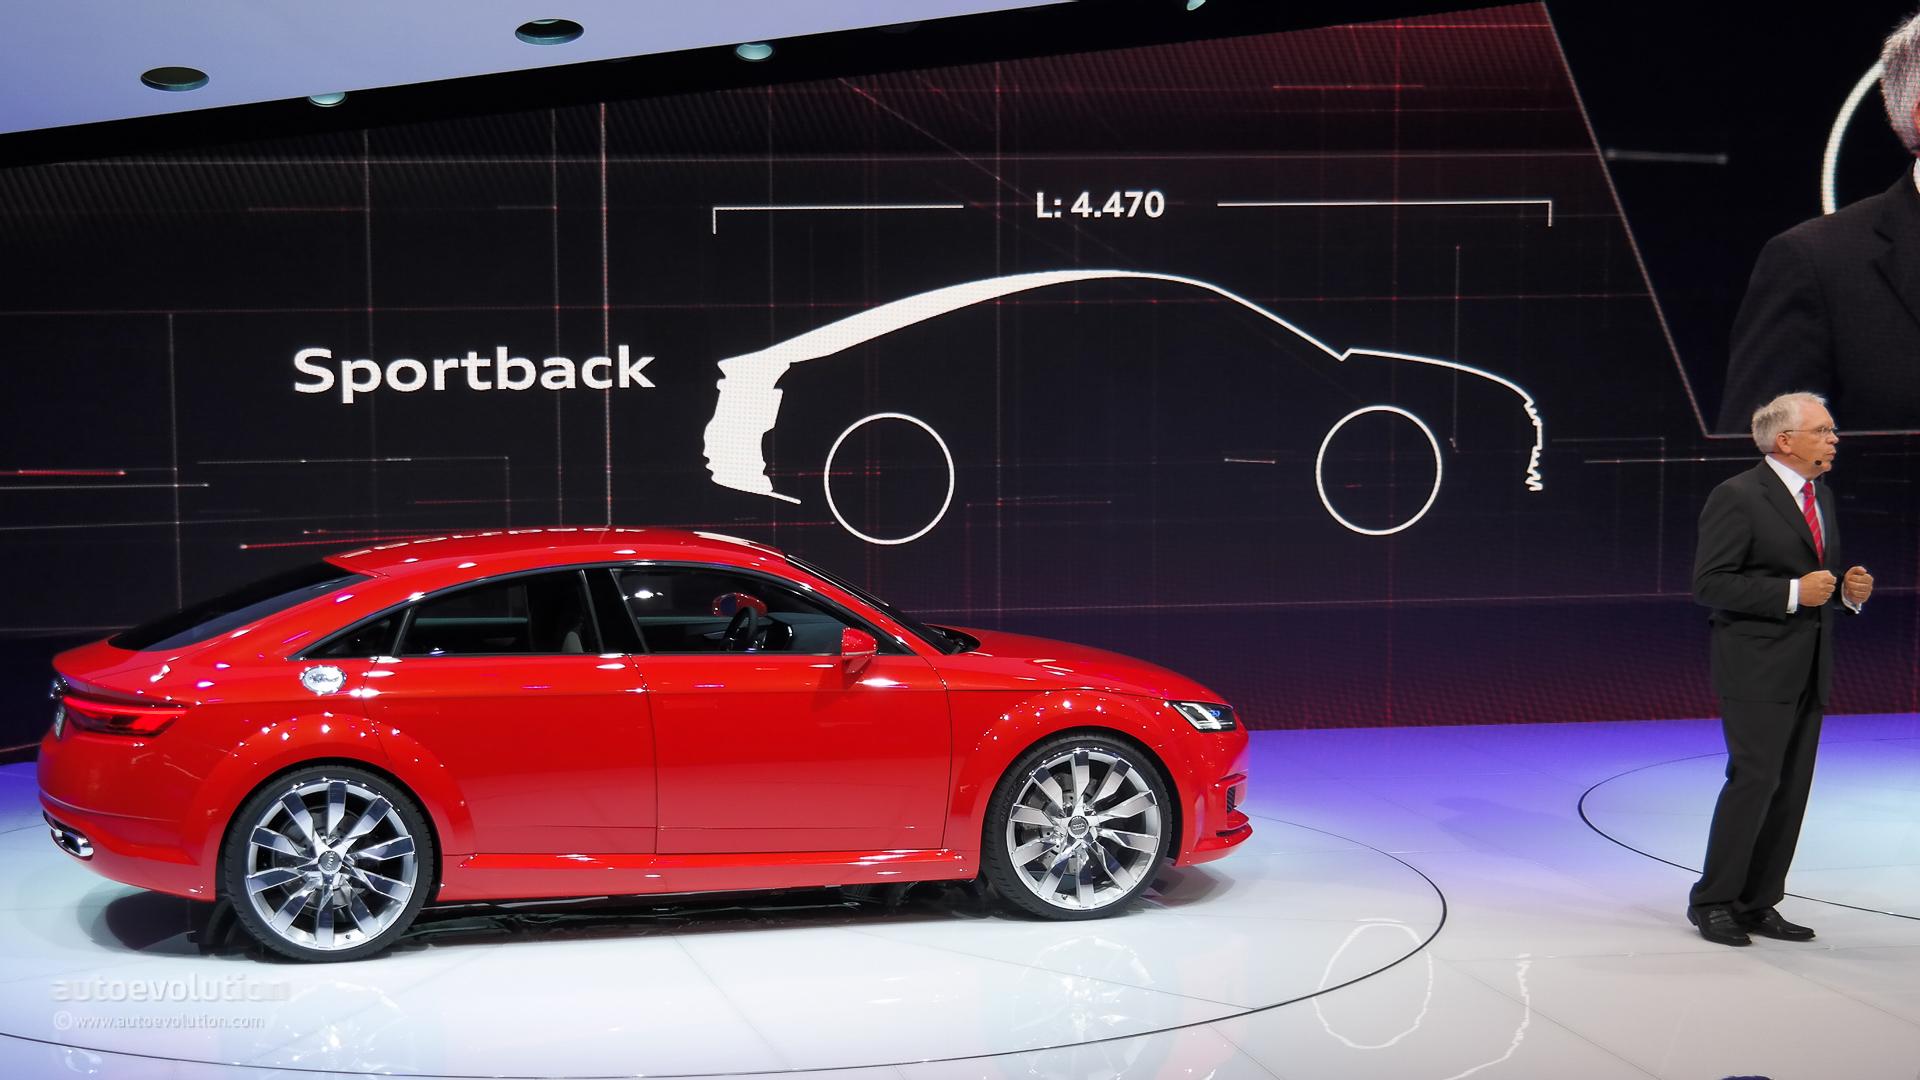 Audi Tt Sportback To Debut On November 20 At The Guangzhou